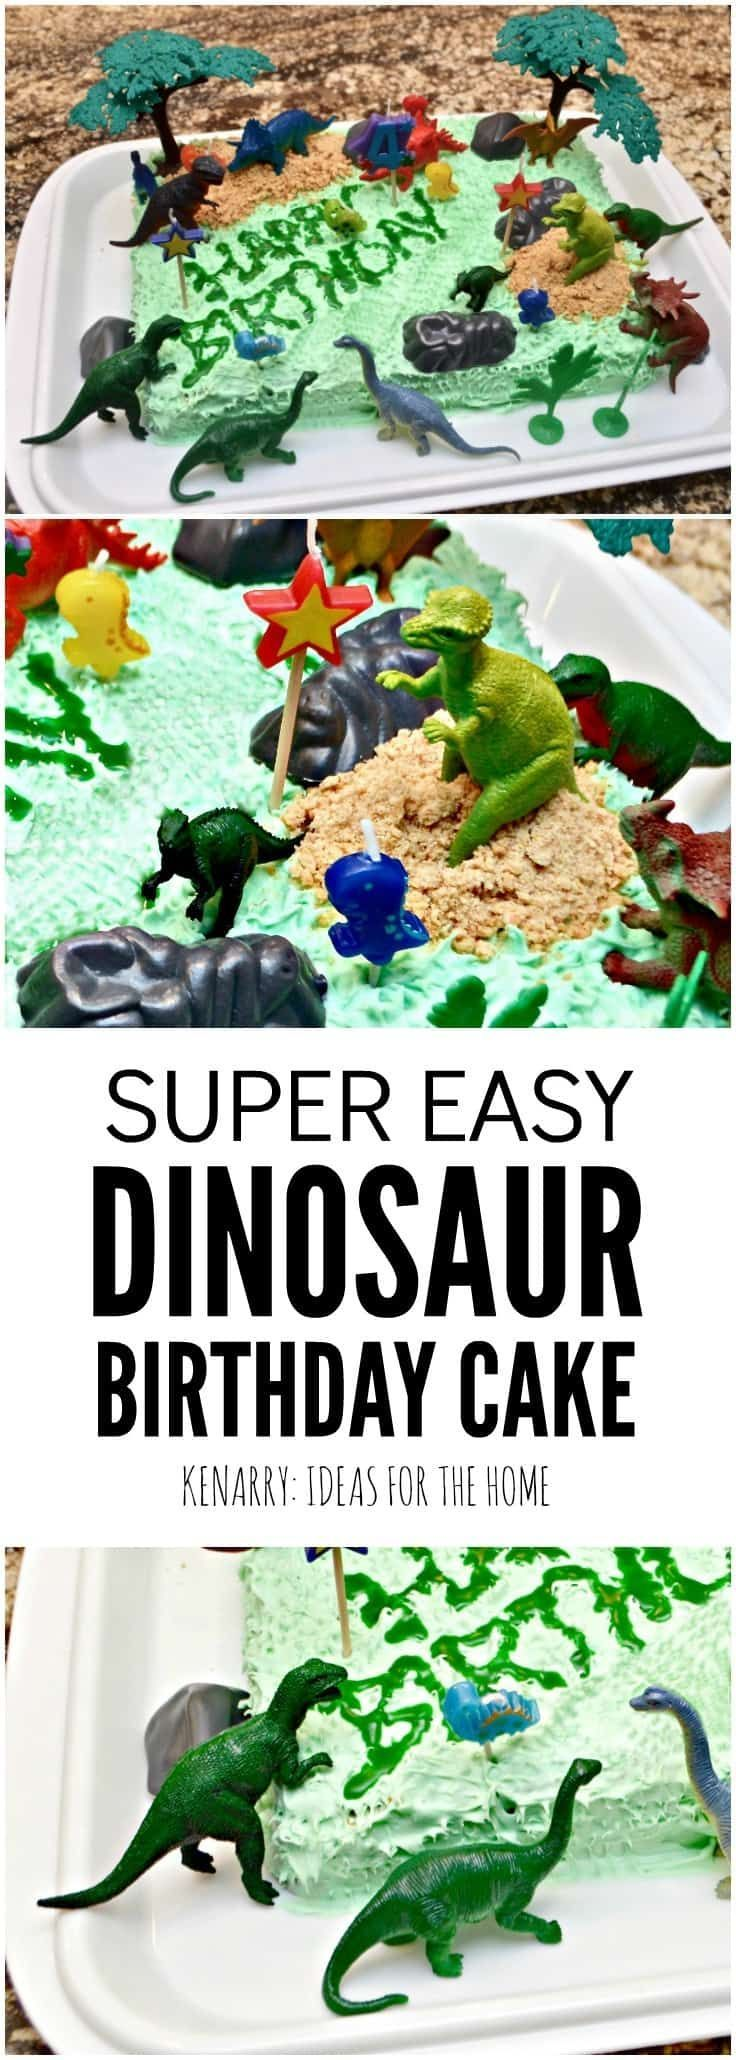 123 best DINOSAURS images on Pinterest   Dinosaur activities ...